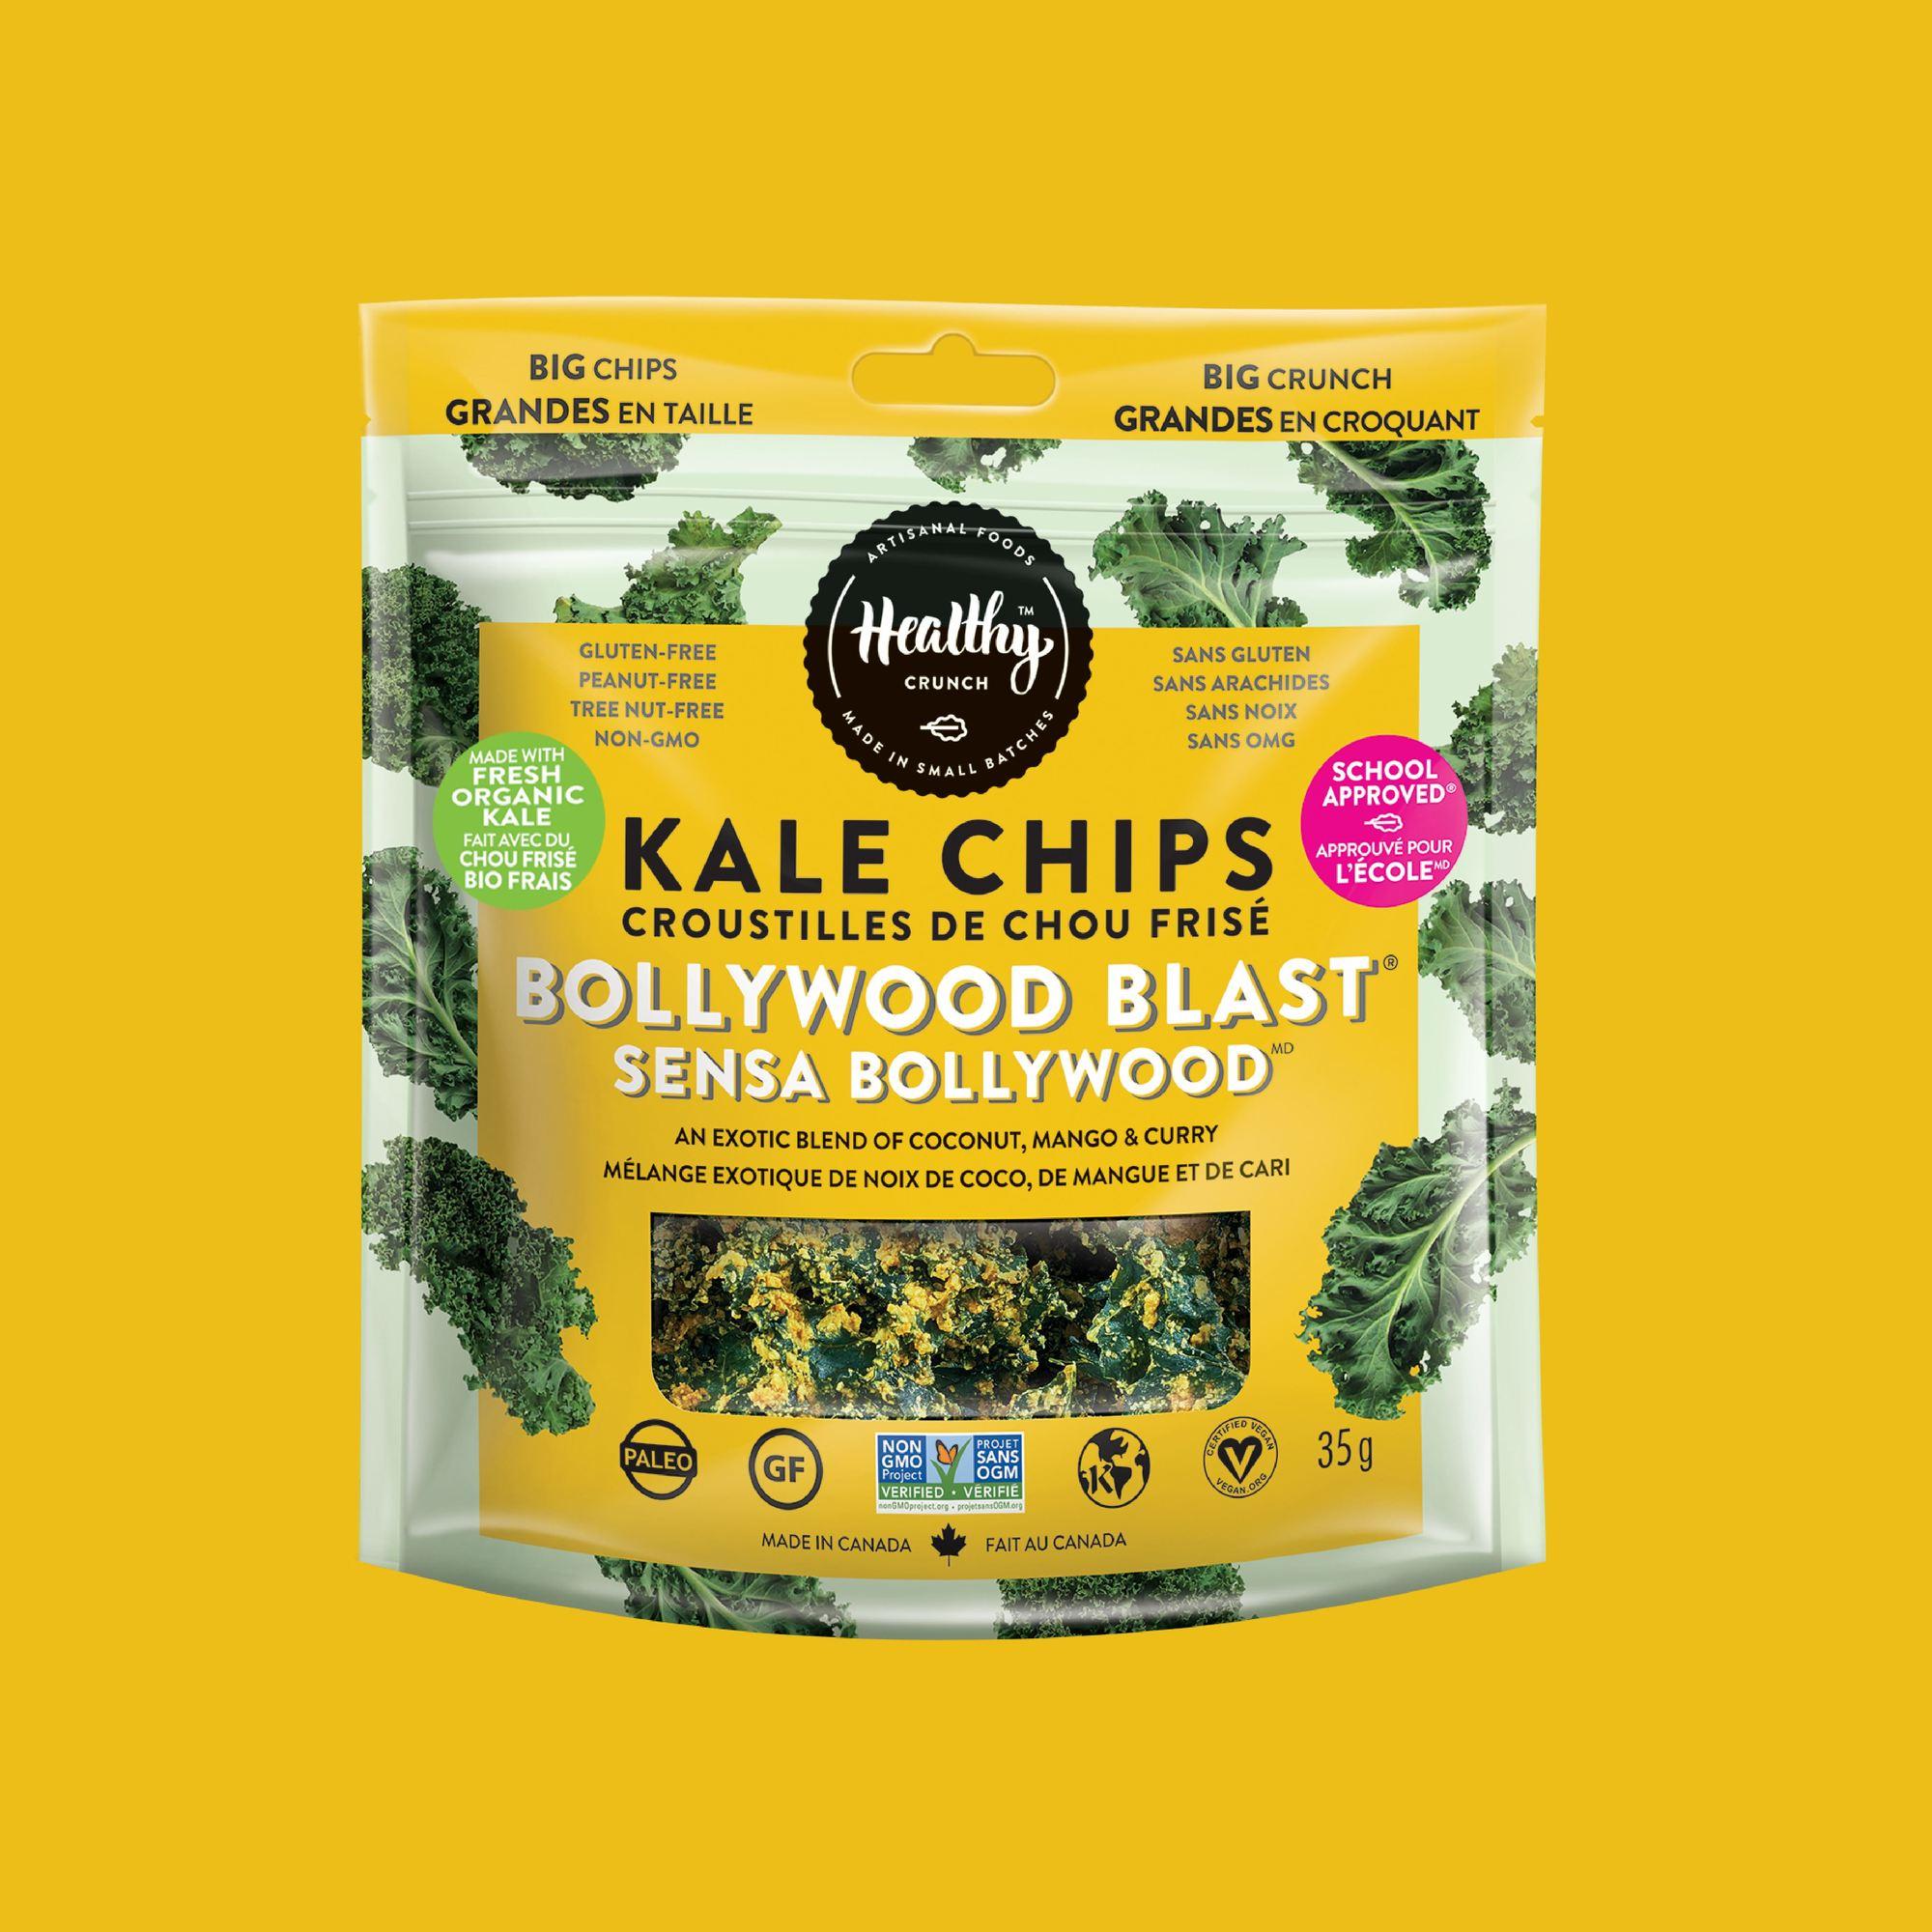 Bollywood Blast Kale Chips